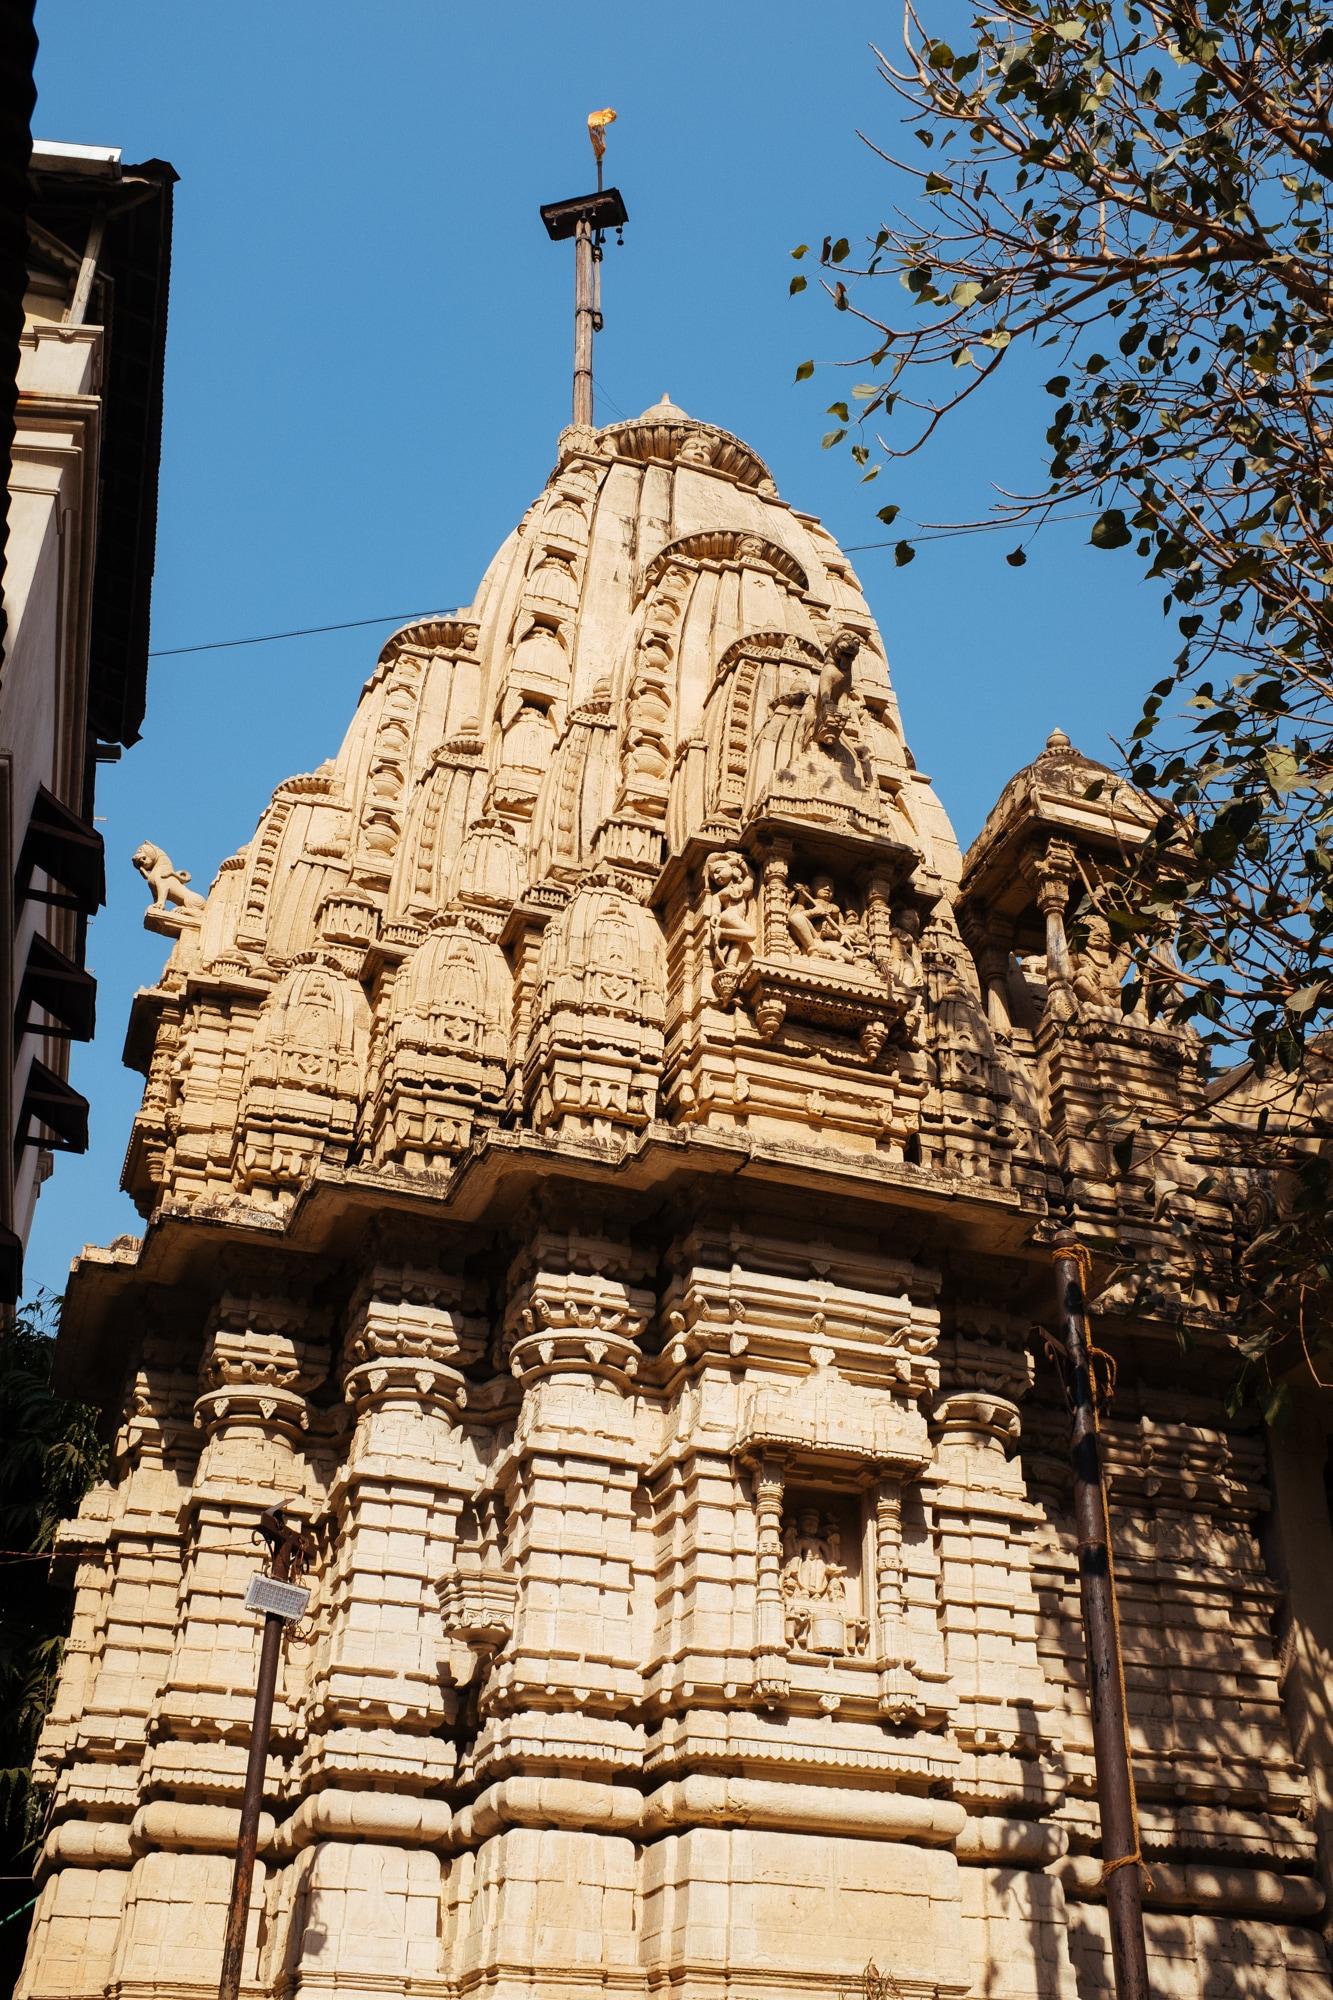 The Hatkeshwar Mahadev temple in Ahmedabad